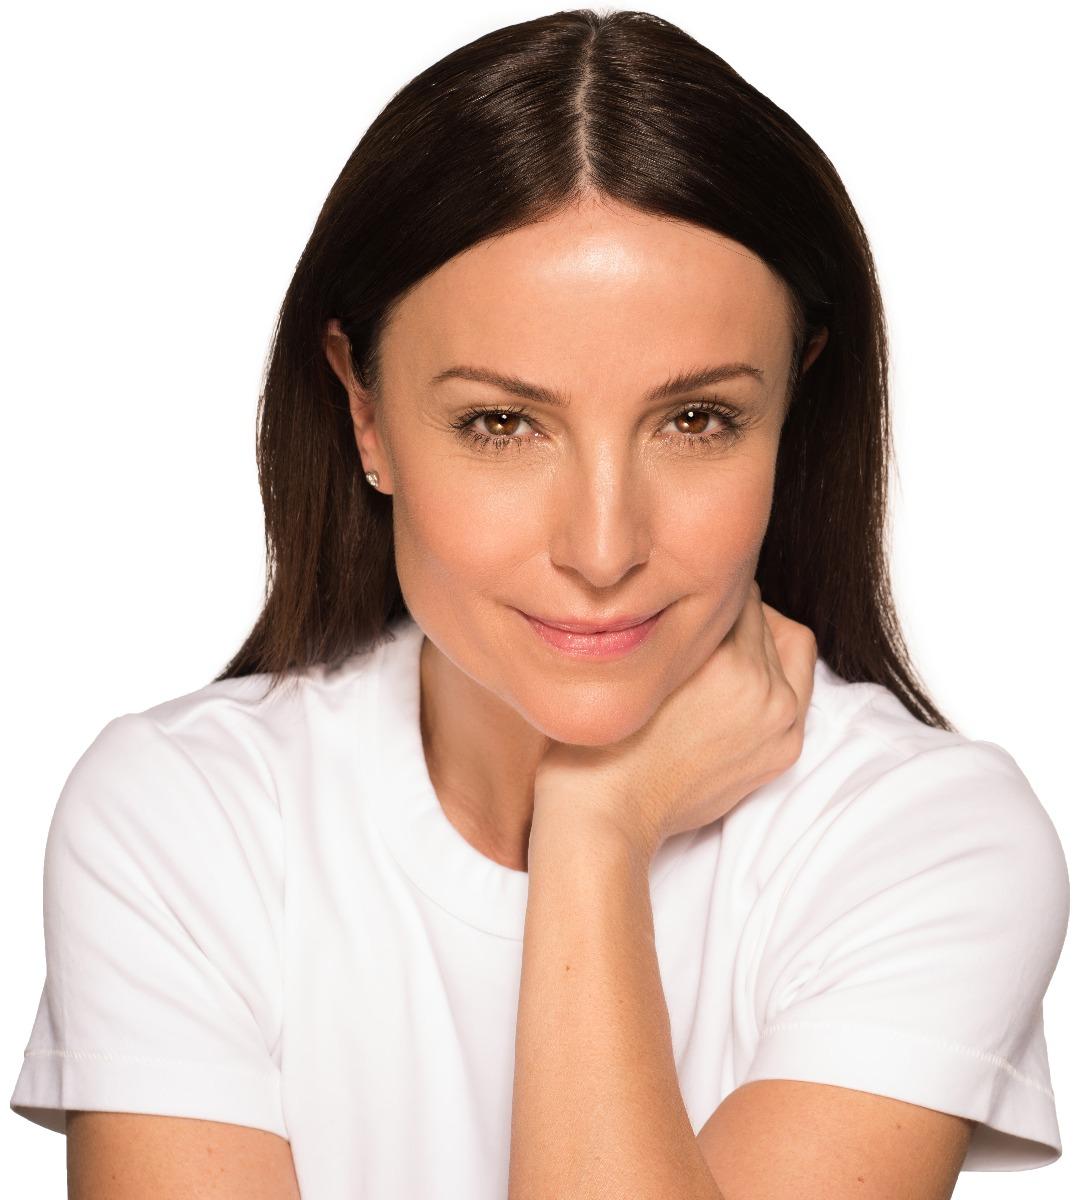 Mature Makeup Application on Model